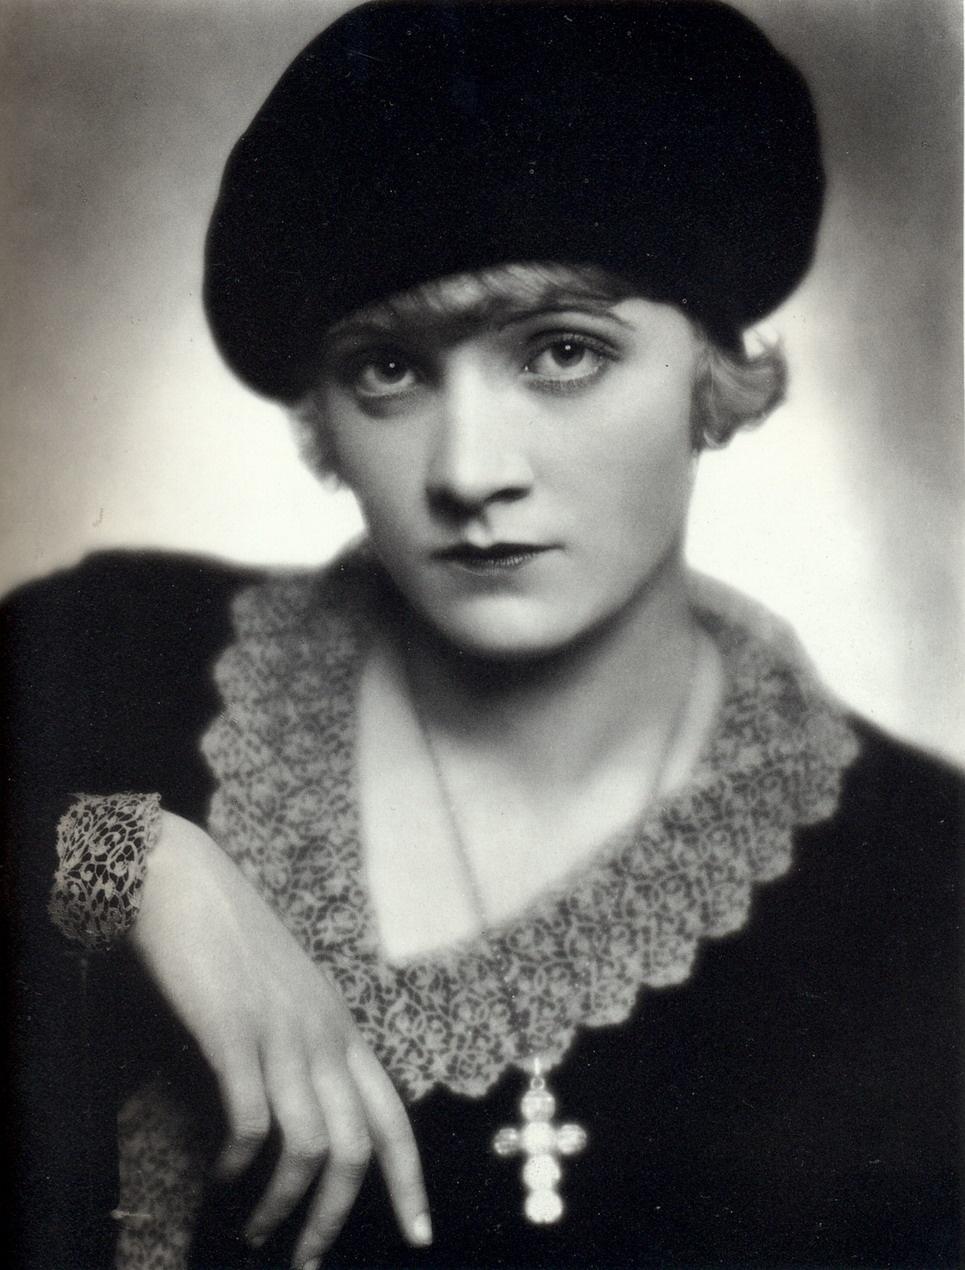 Young Marlene Dietrich